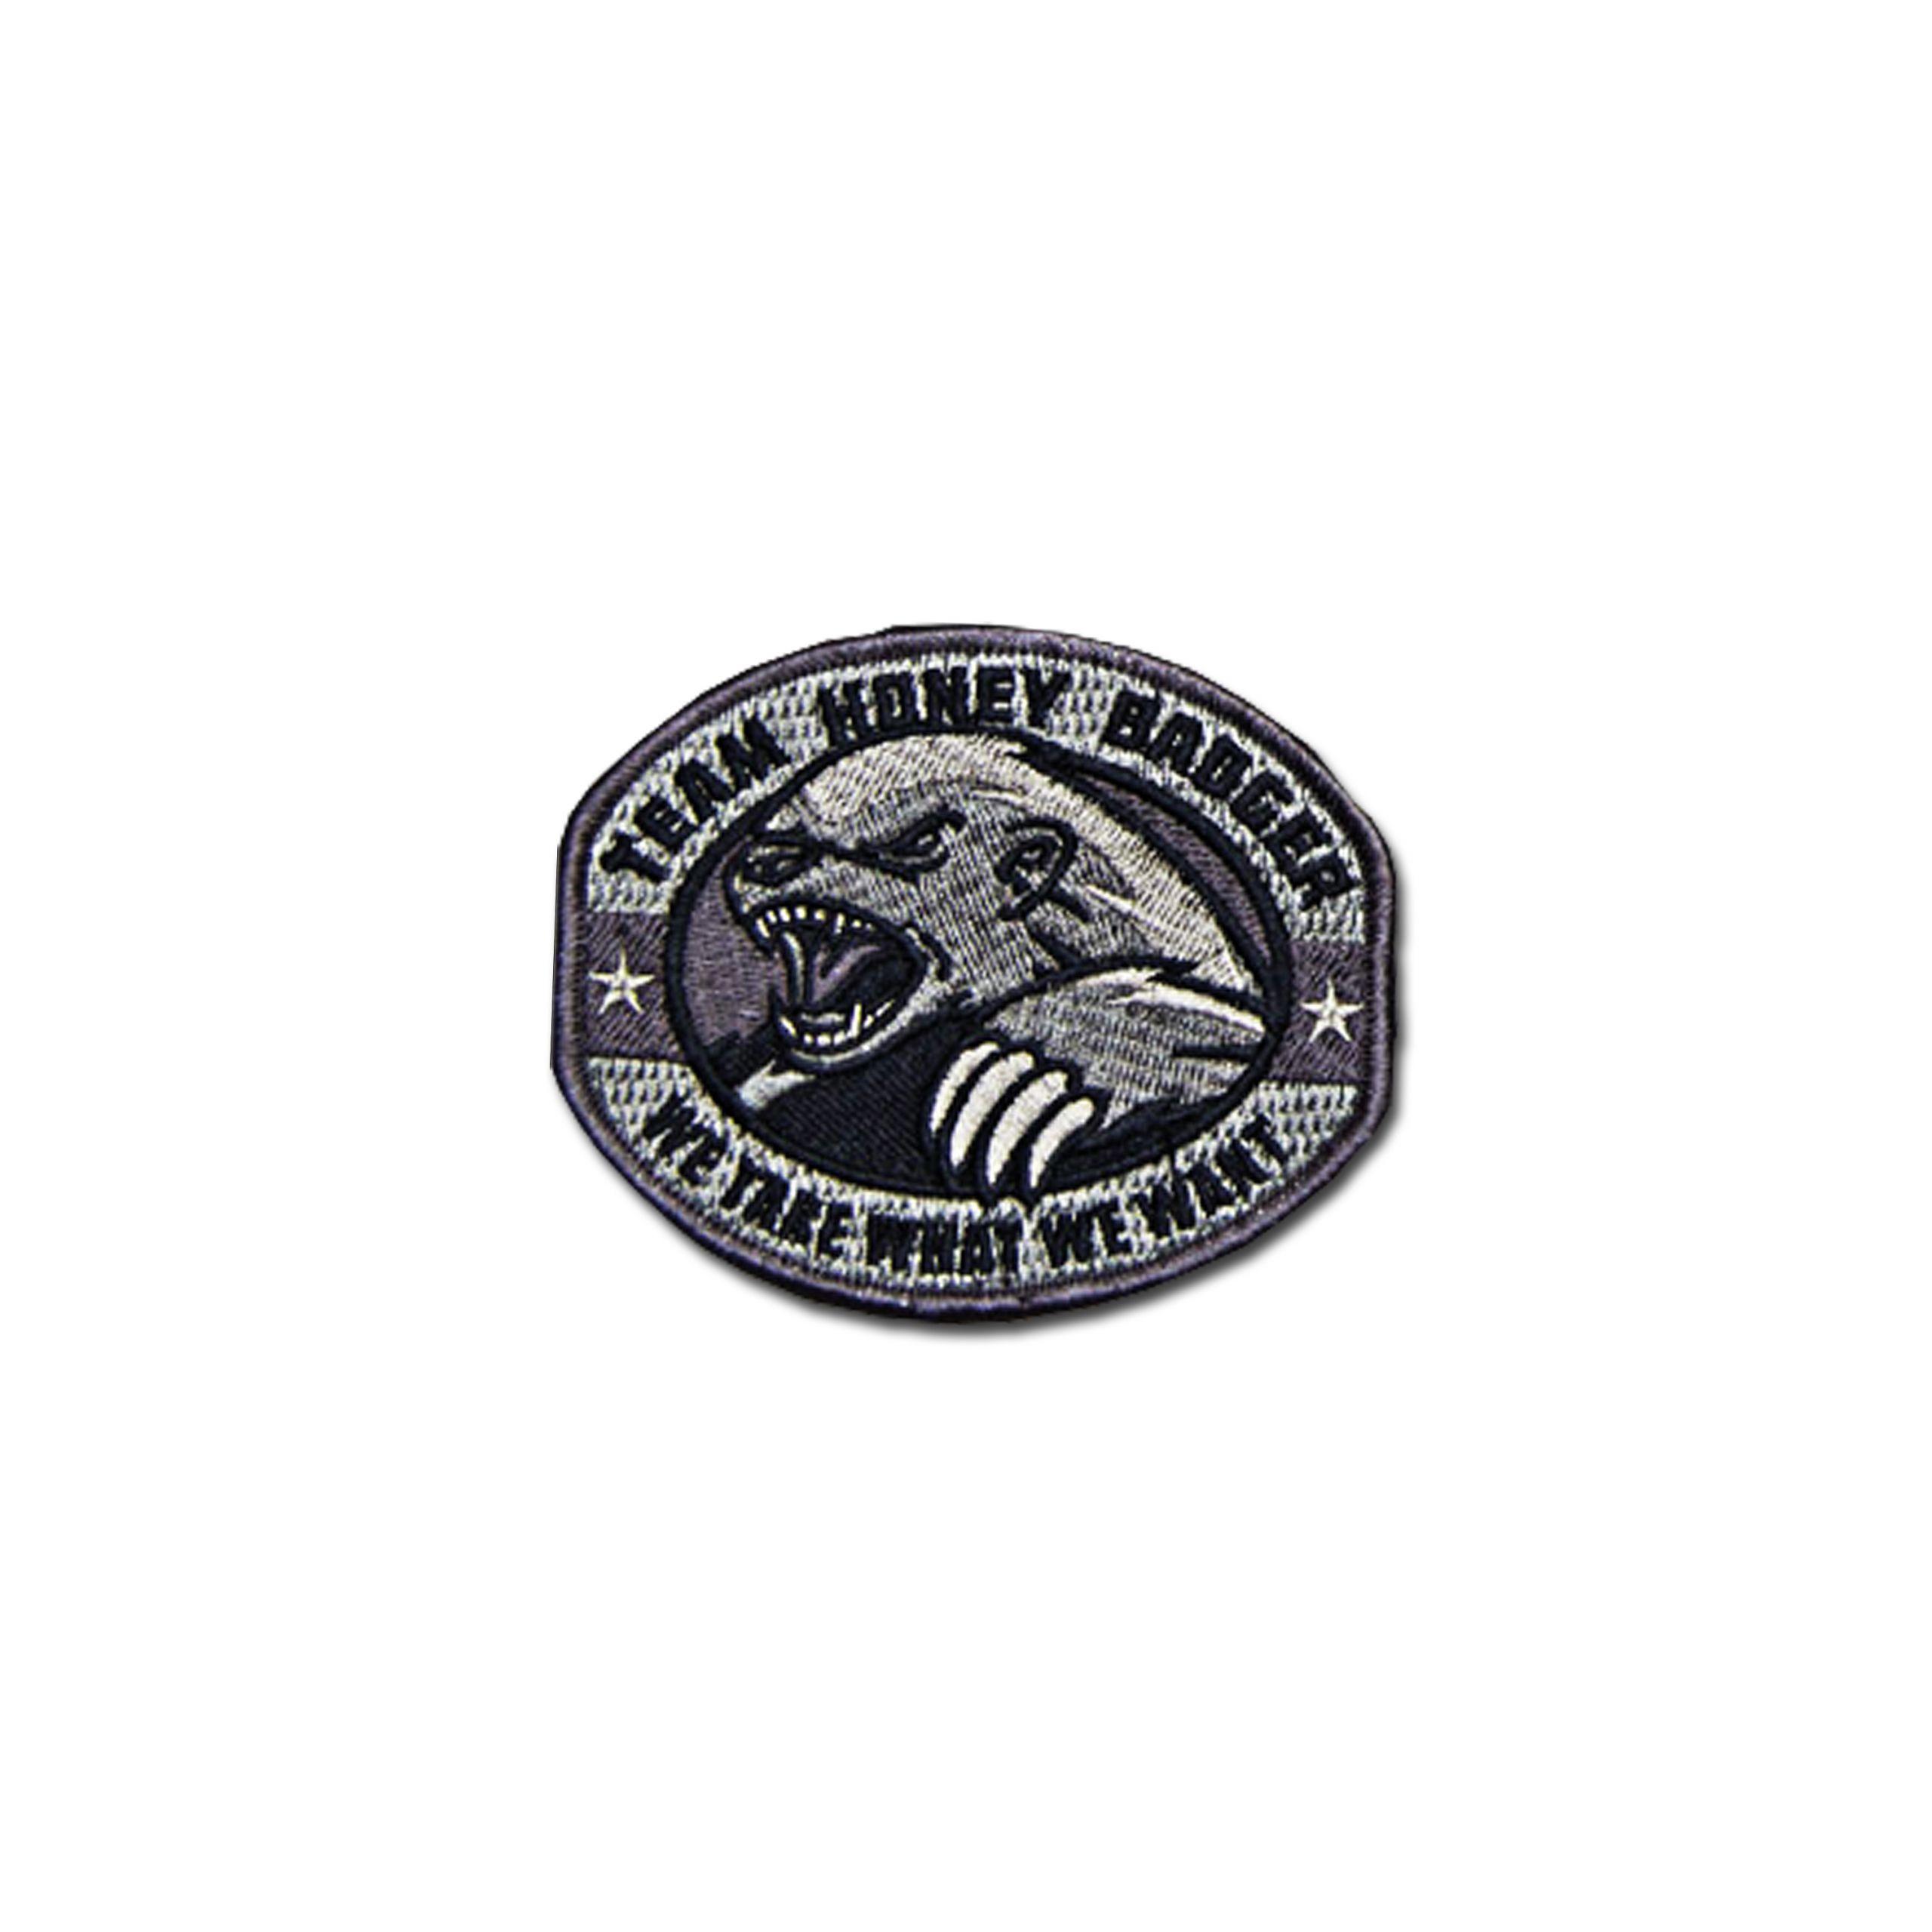 Mil Spec Monkey MSM Honey Badger PVC Patch-Multicam-Woodland-Desert-SWAT-ACU